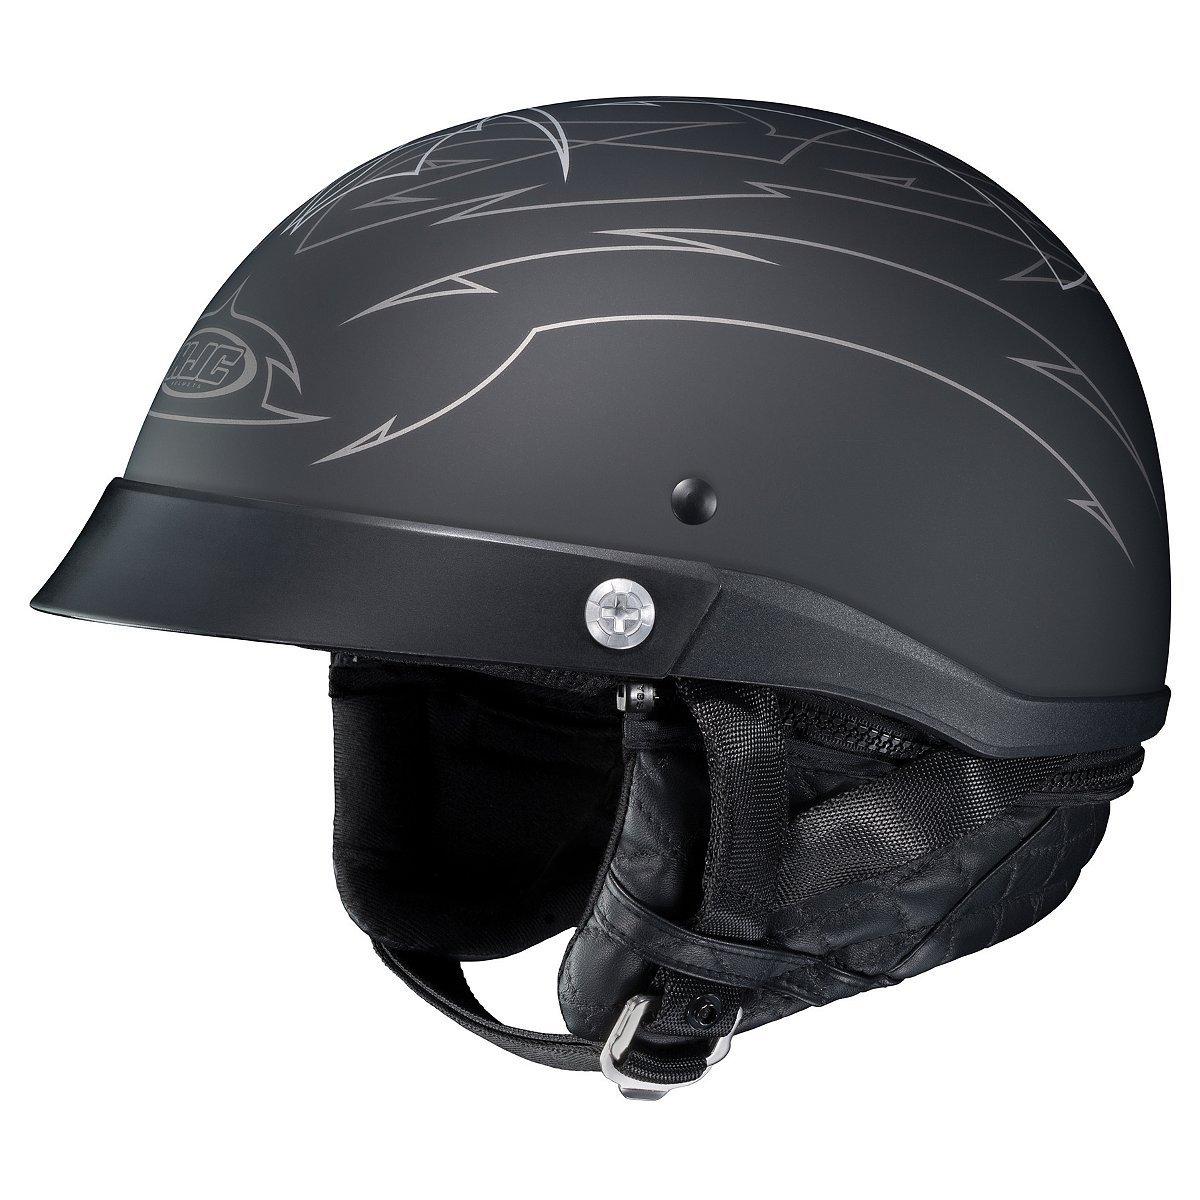 HJC Helmets Unisex-Adult Half-Size-Helmet-Style CL-Iron Road Show Boat MC5F Helmet (Black, Small)